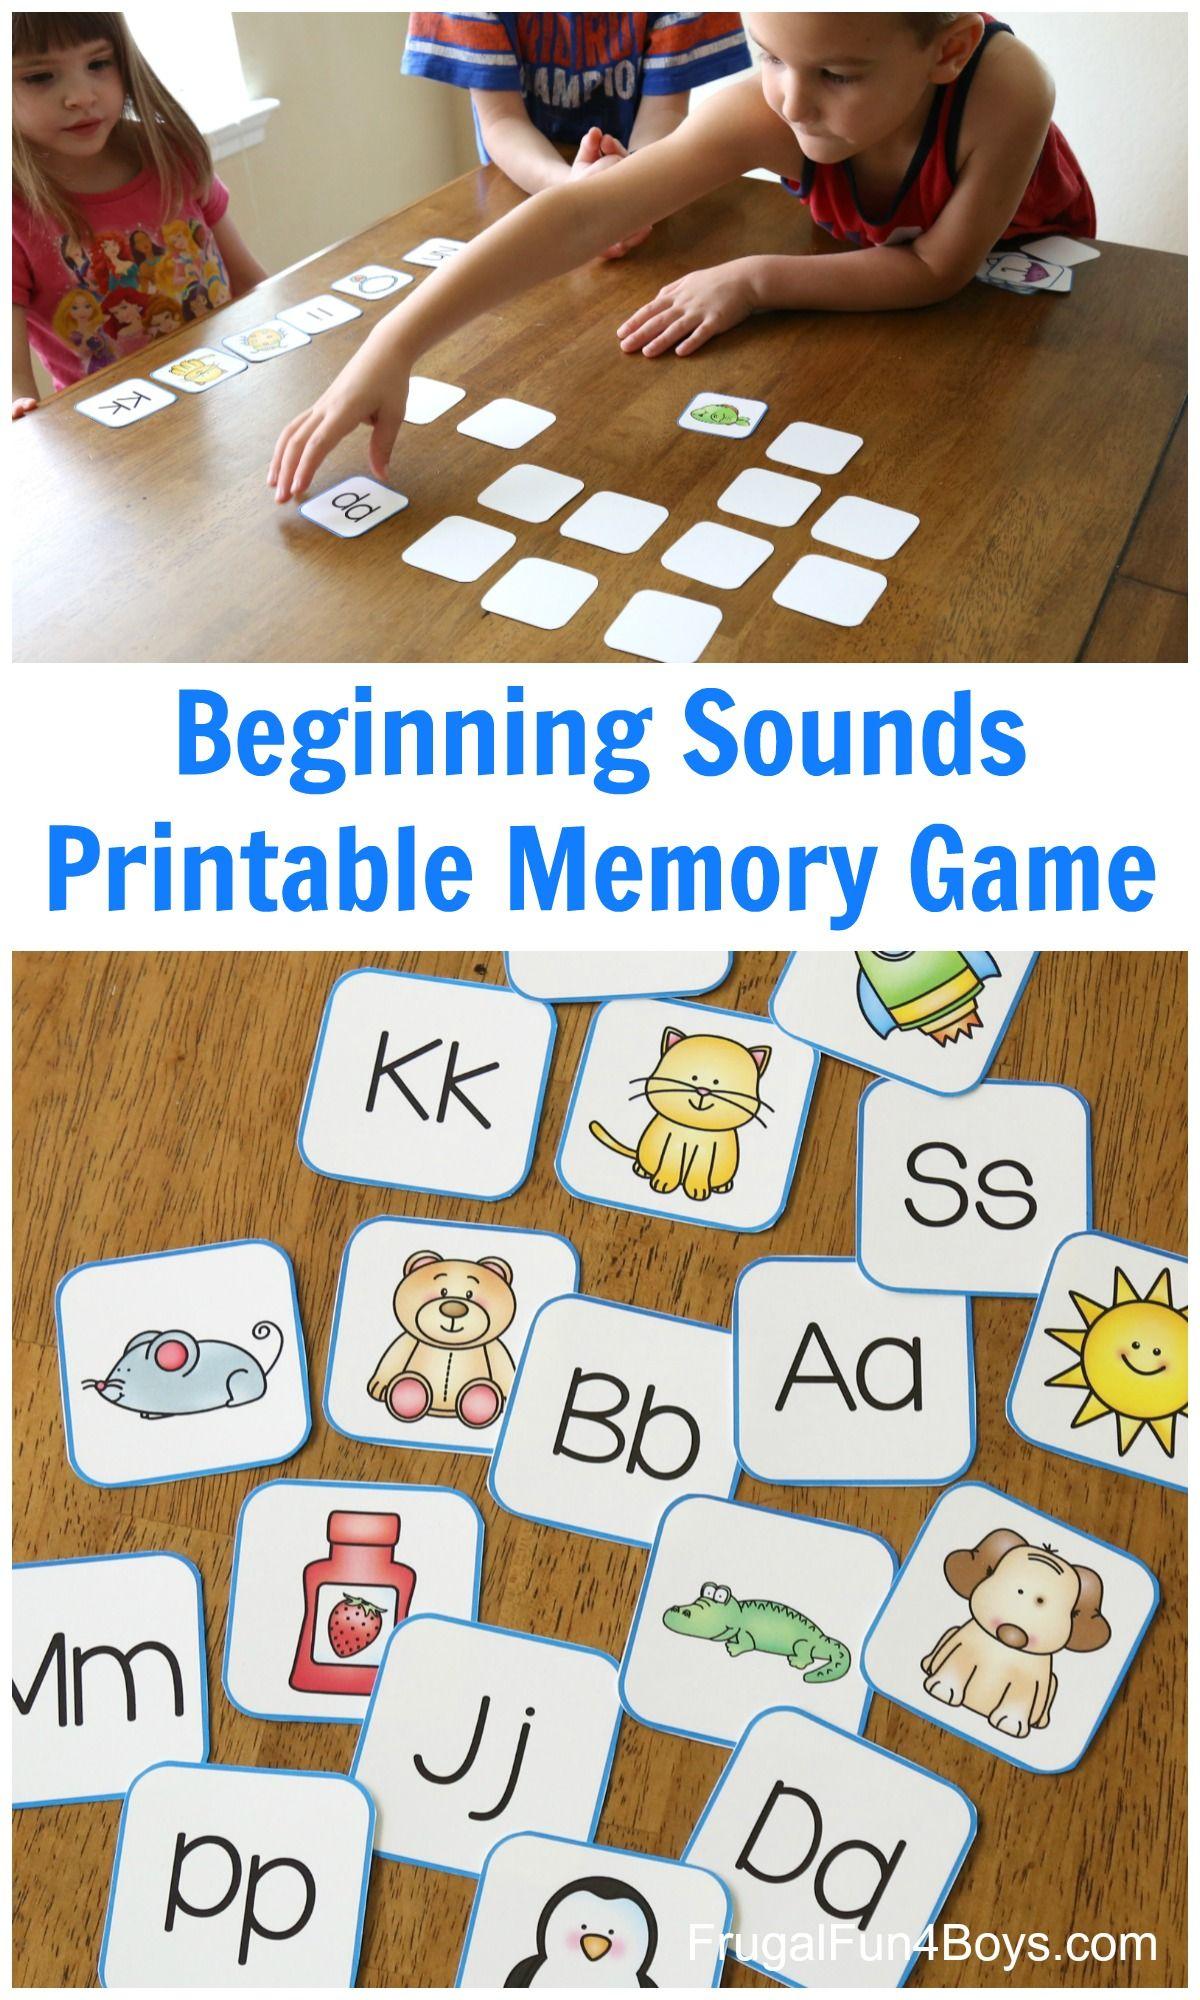 Printable Alphabet Memory Game Cards